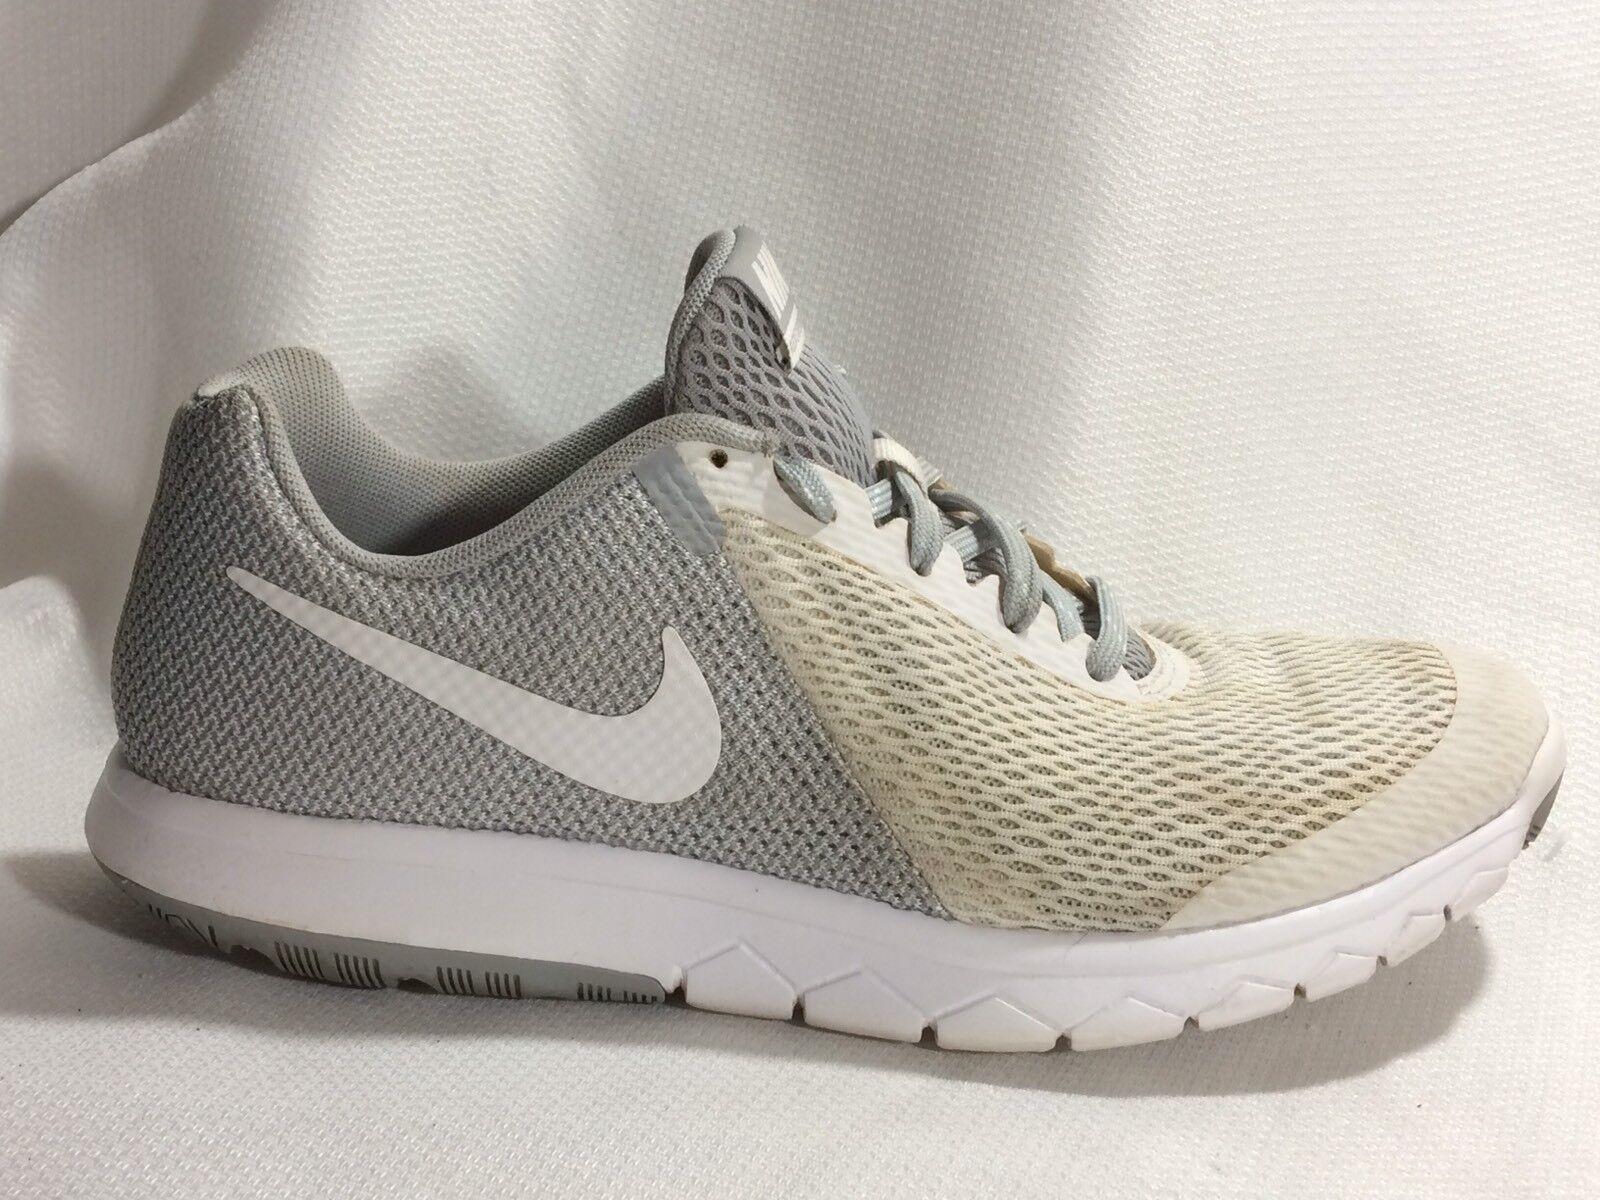 finest selection eb9e2 8880b NIKE Women 8.5 M Flex Experience RN 5 Running Running Running Shoe  844729-100 Sneaker